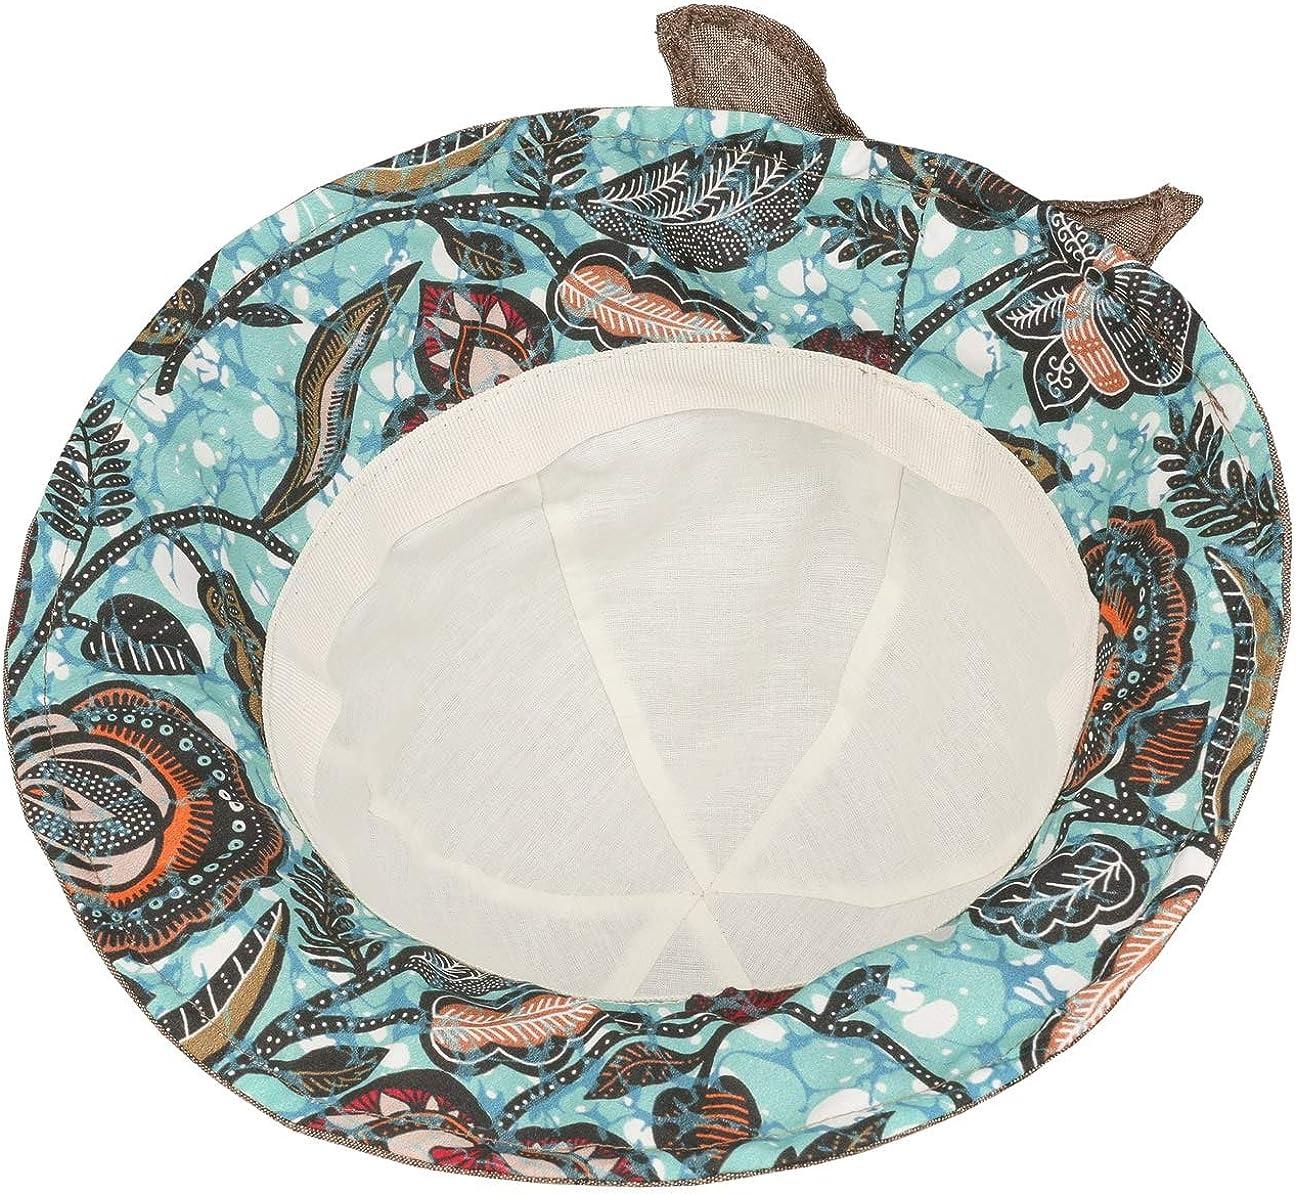 Lipodo Chapeau en Tissu Balima Femme Made in Italy DEte Cloche de Soleil Printemps-ete